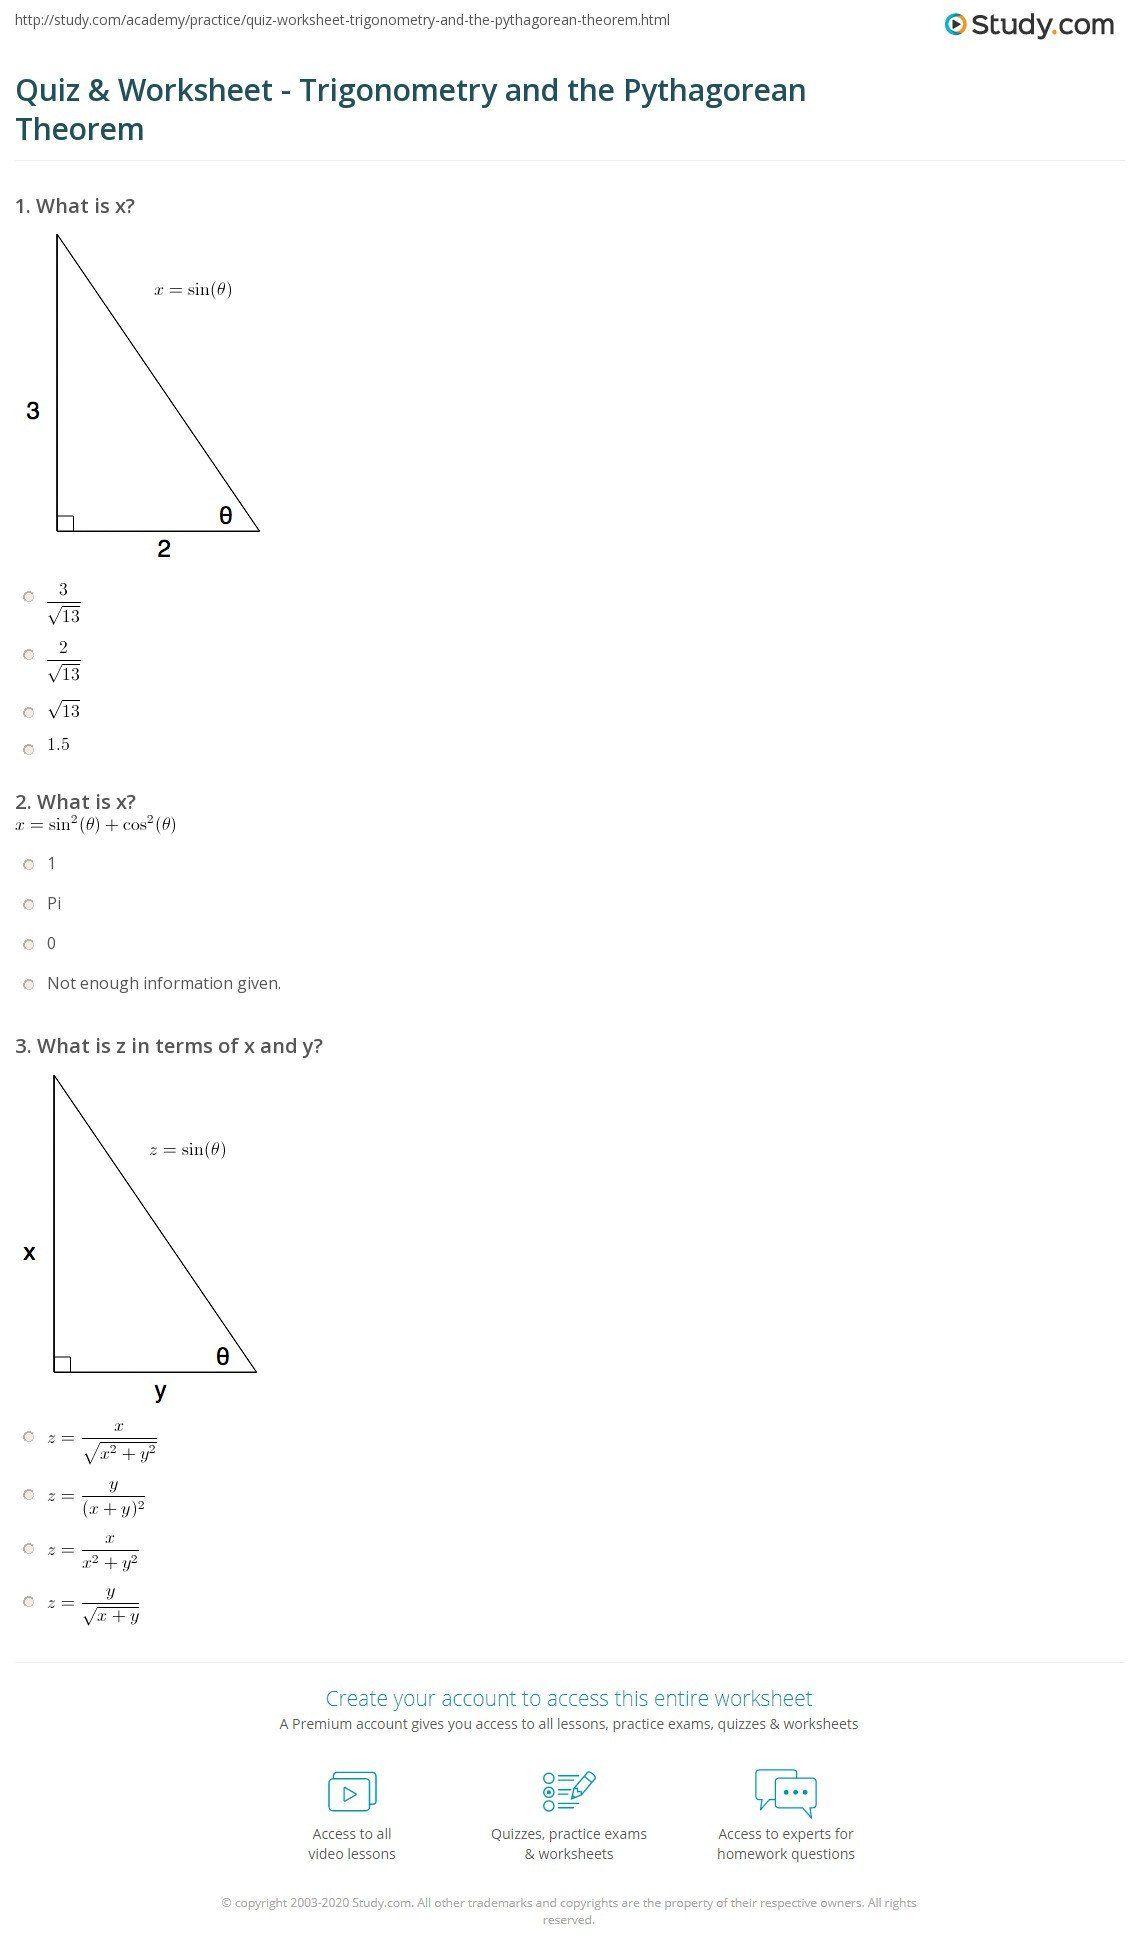 The Pythagorean theorem Worksheet Quiz & Worksheet